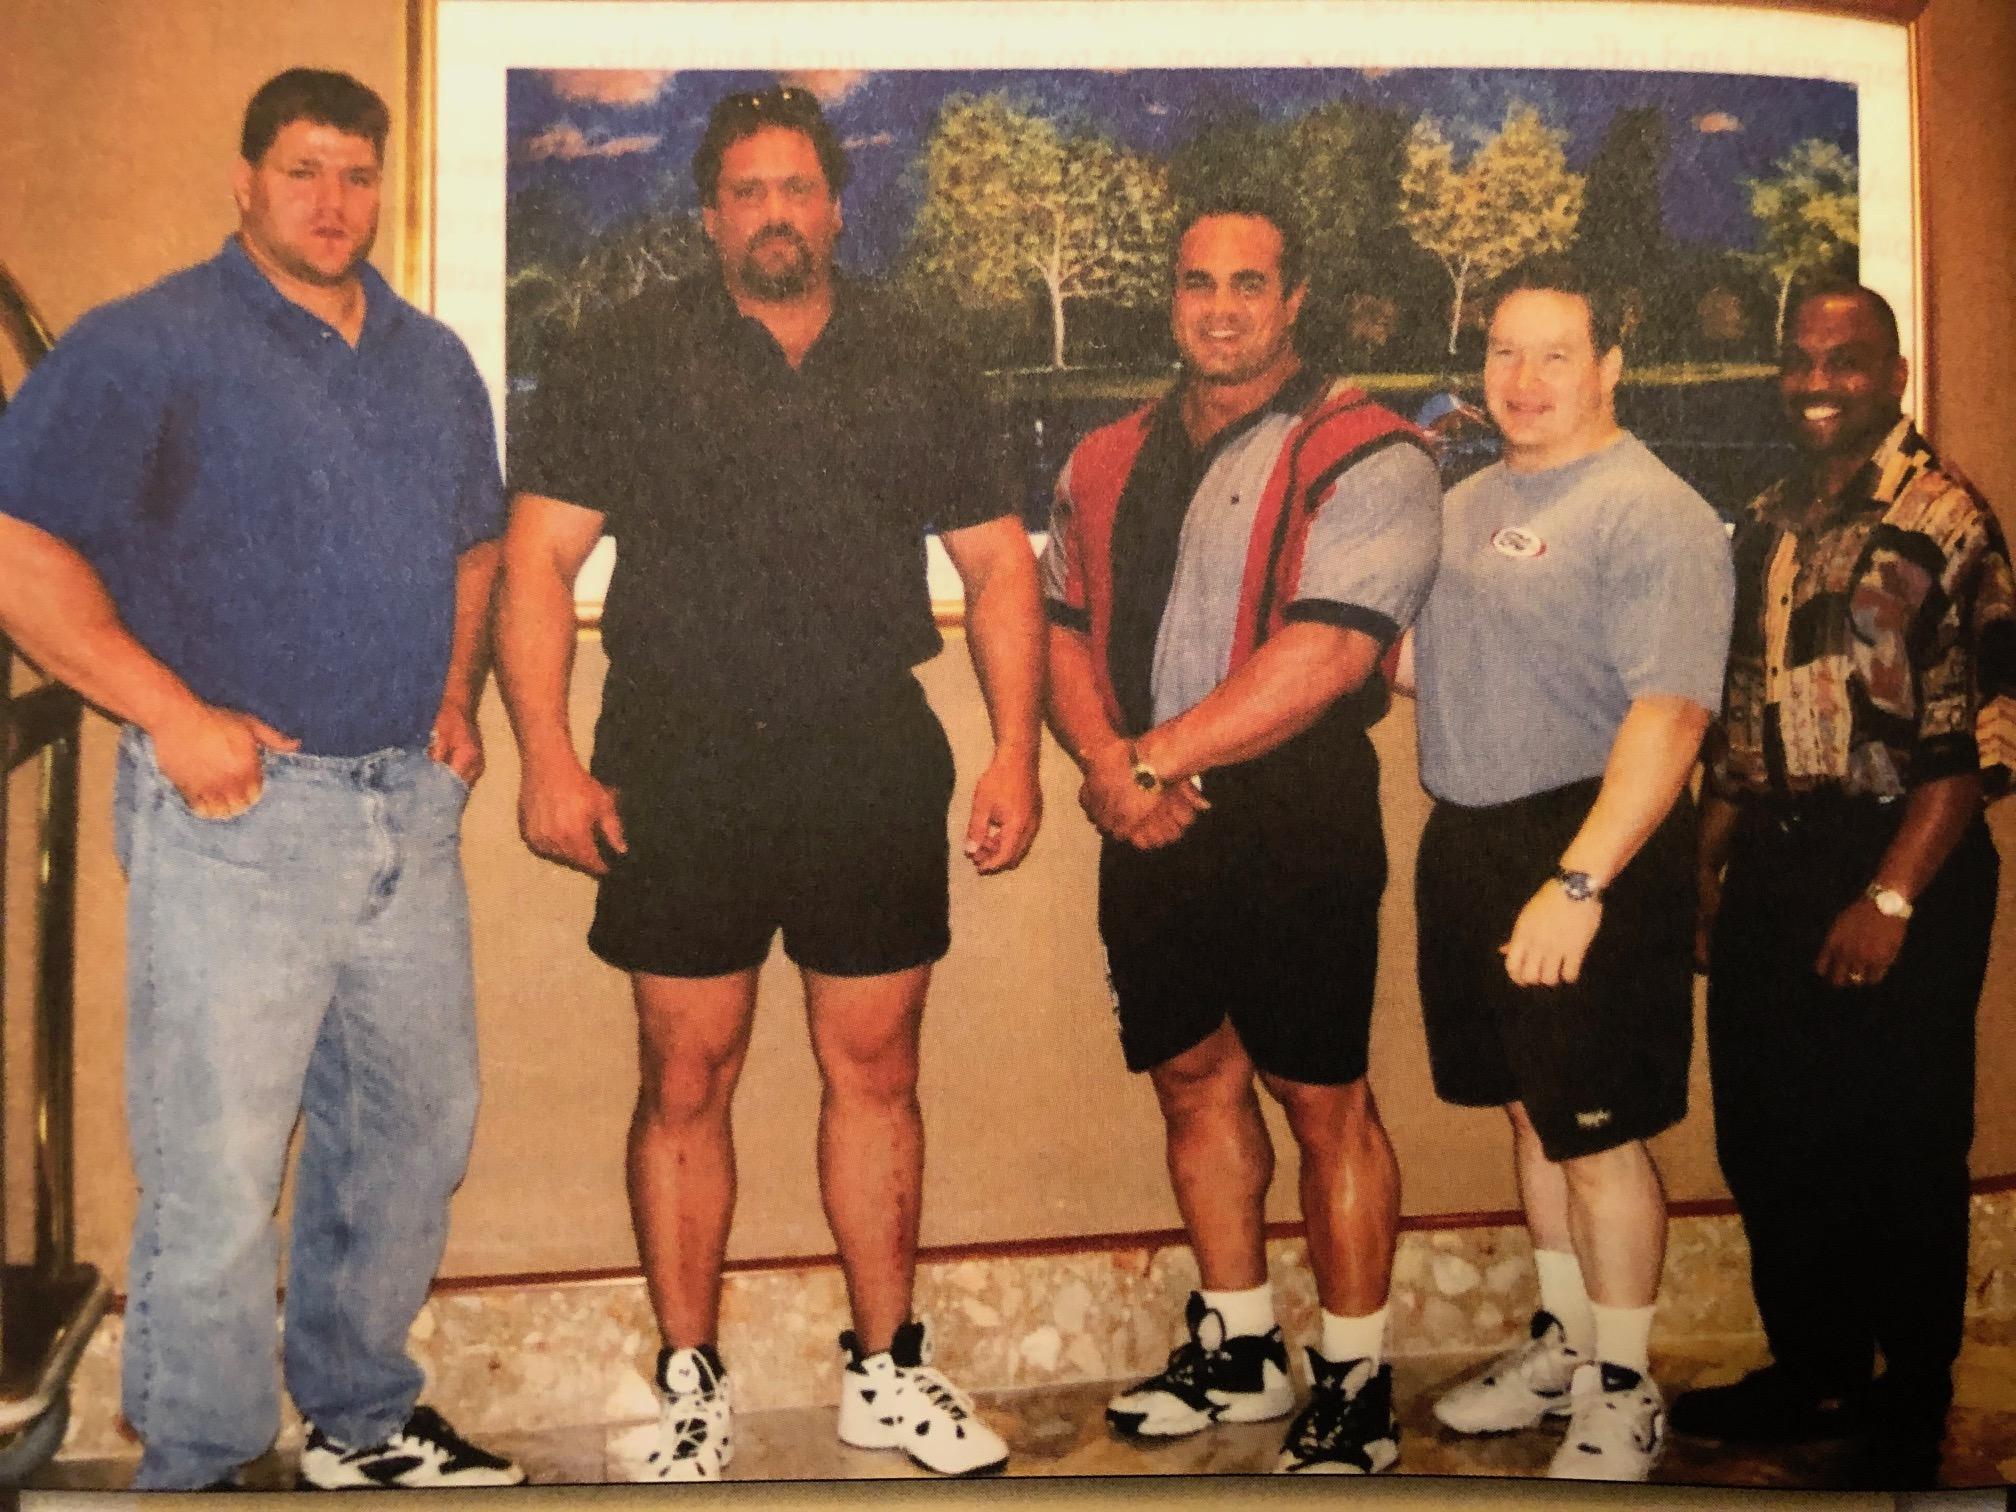 Powerlifters Brad Gillingham, Ed Coan, Gene Bell, Bobby Myers and Anthony D'Arrezo